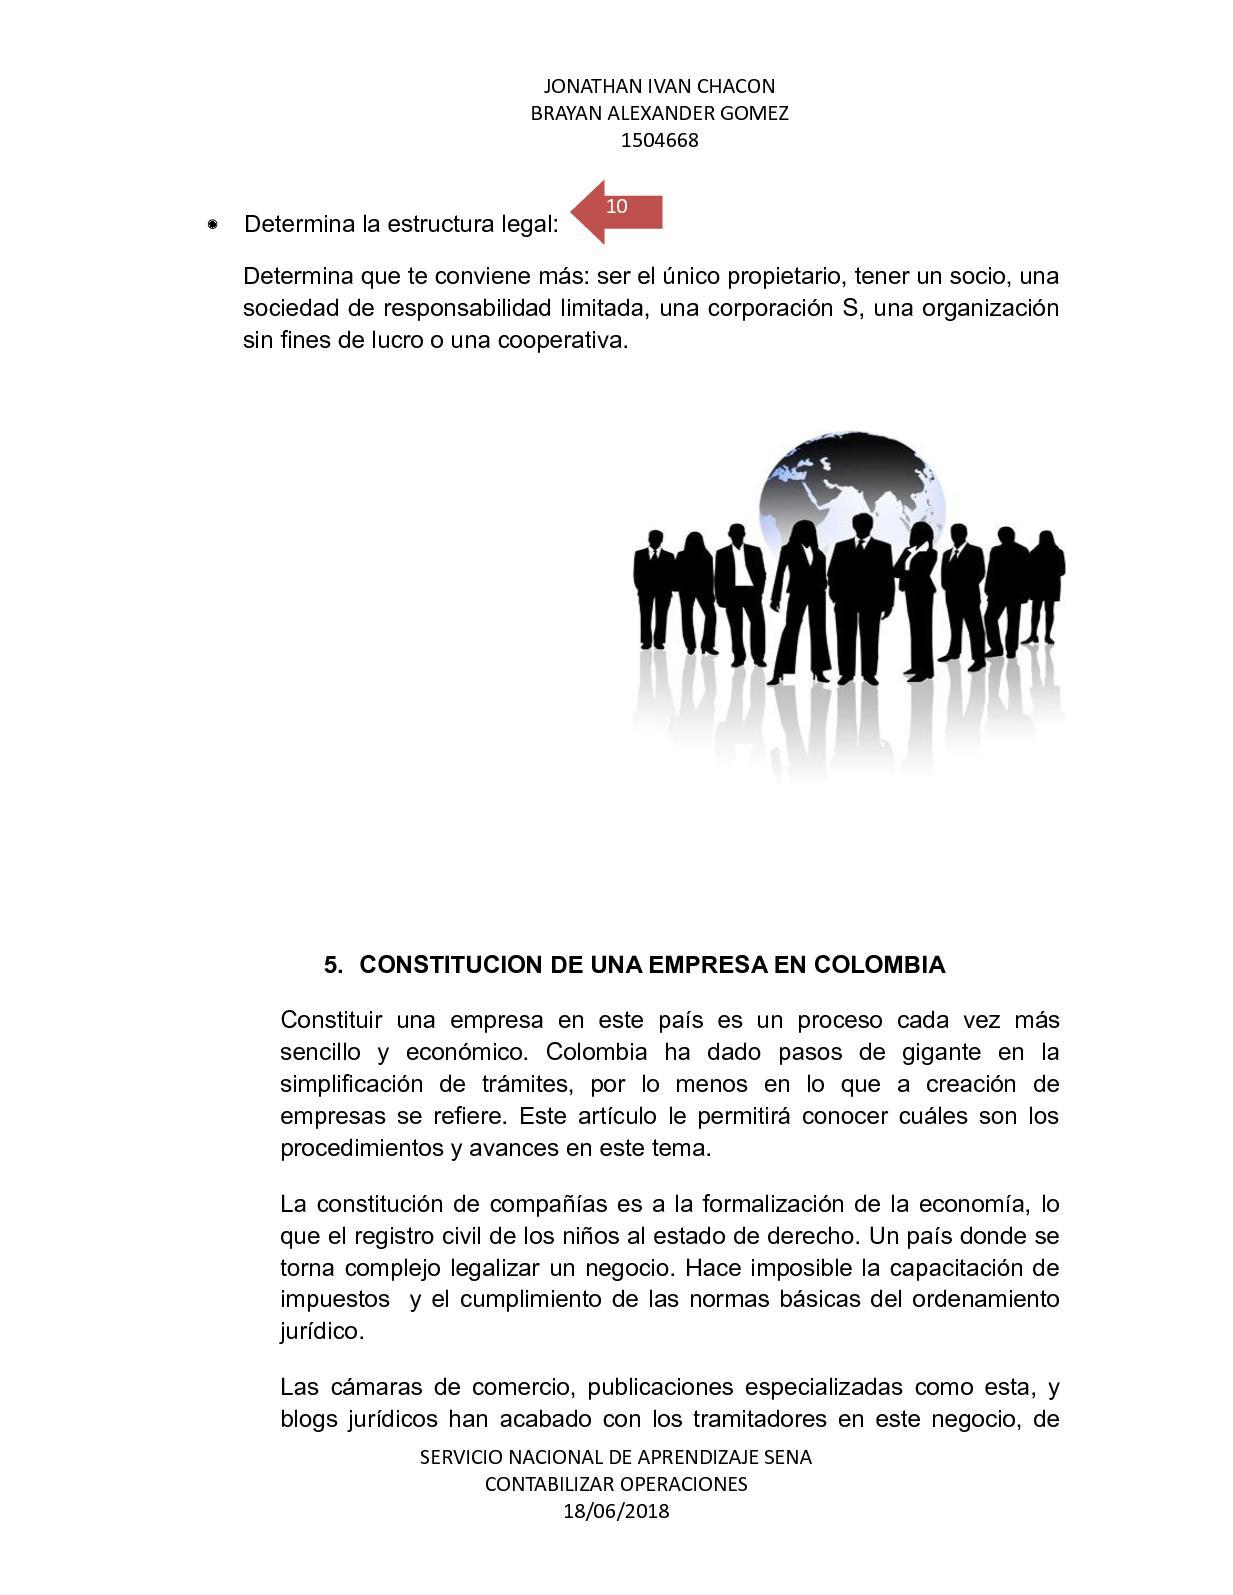 Constitucion De Empresa Cartilla Calameo Contabilidad